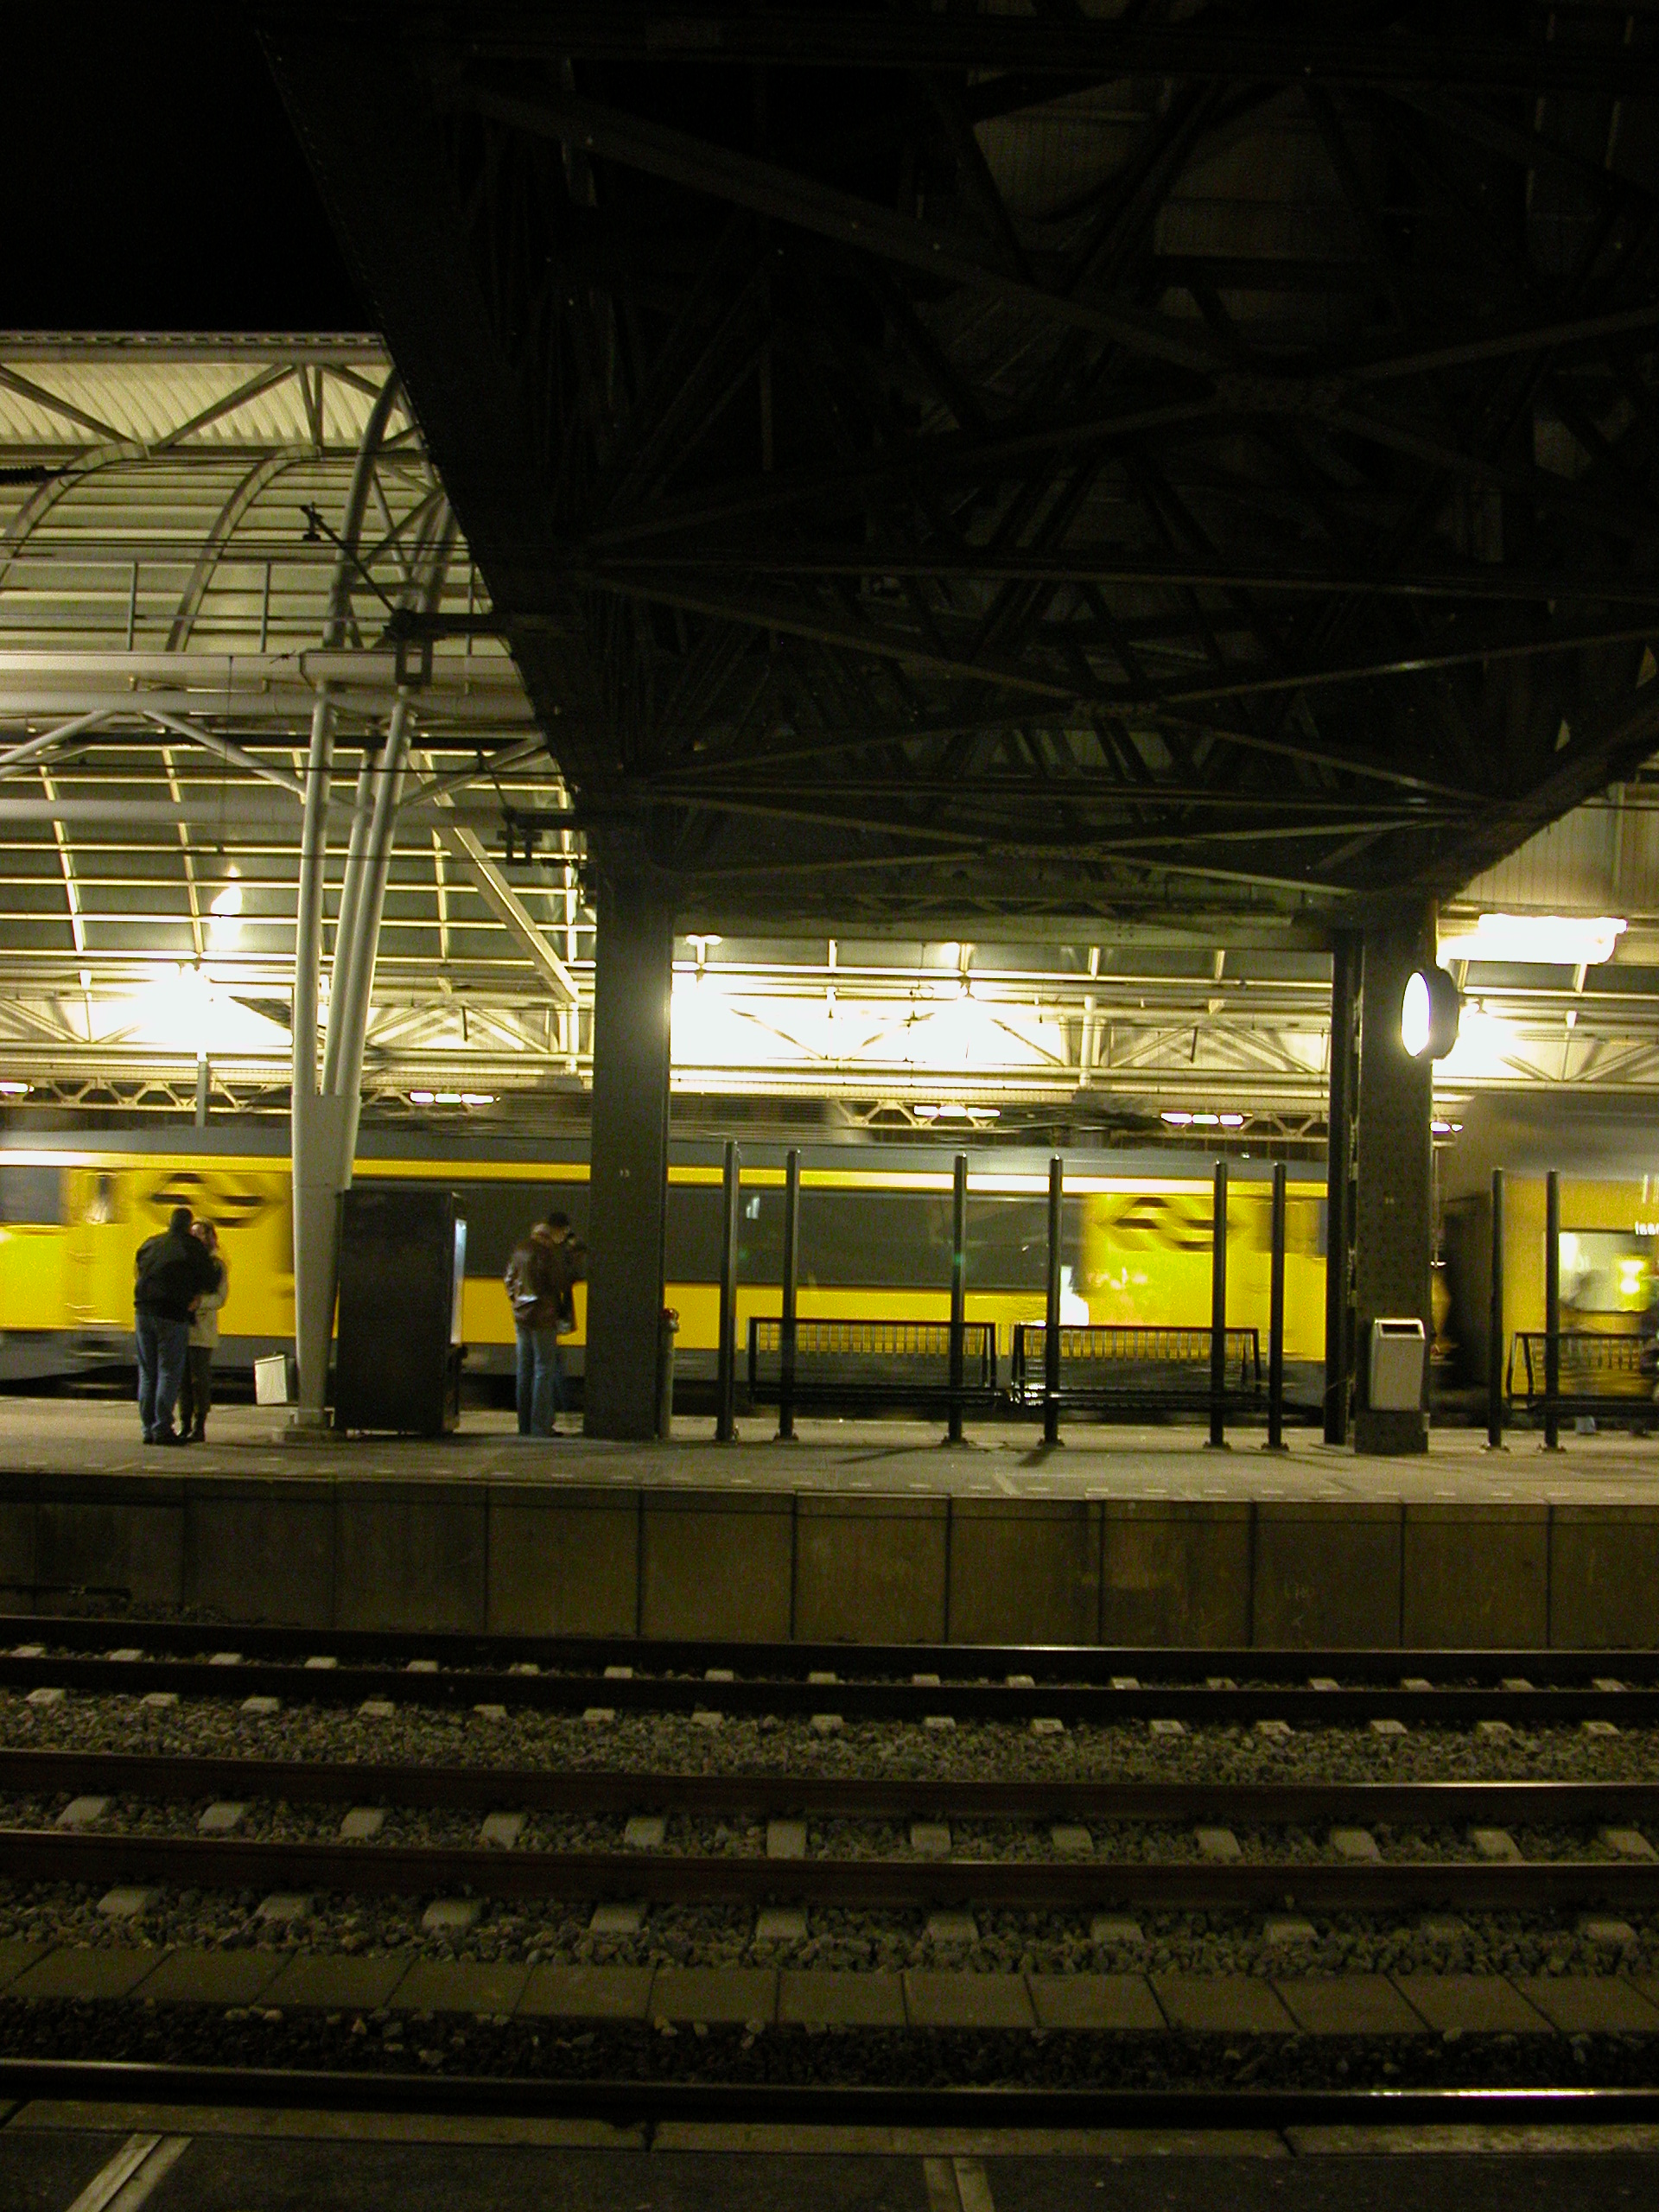 train trains station speeding past rails